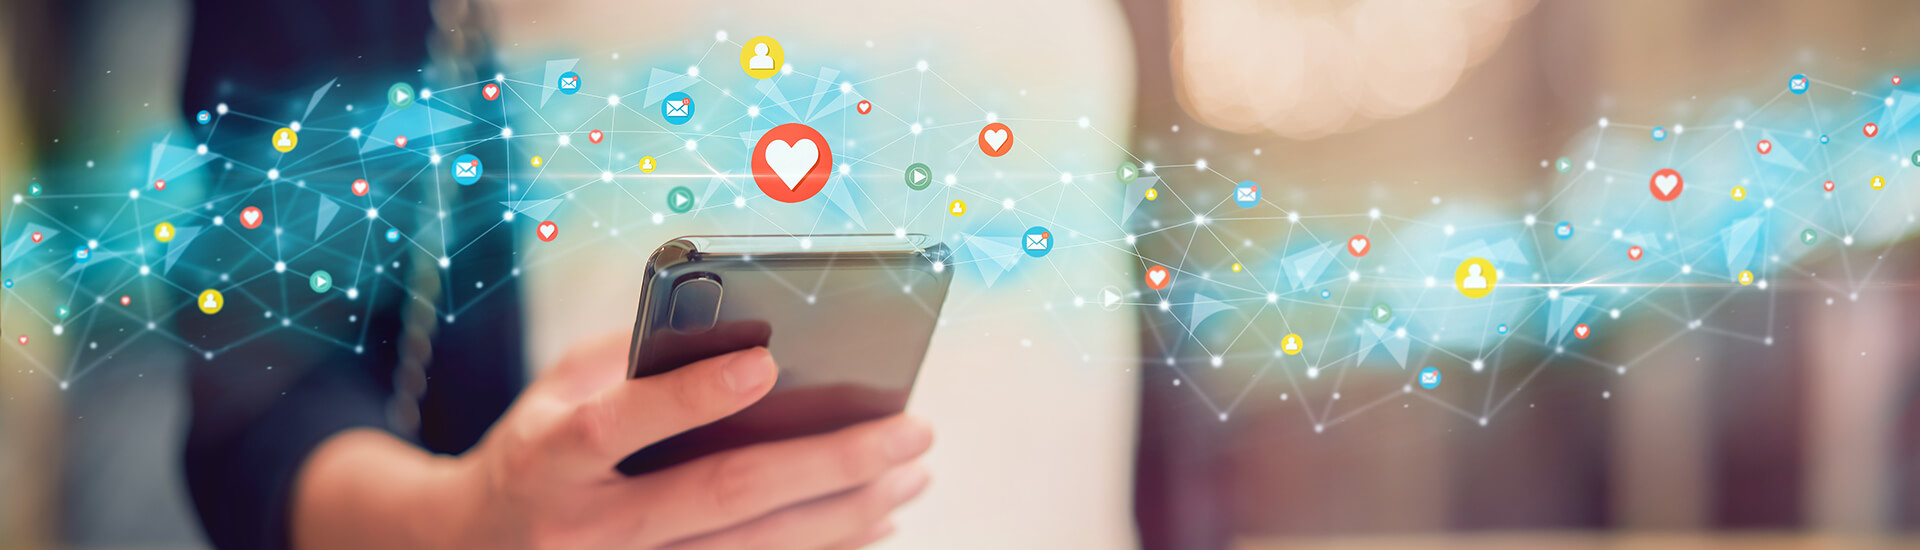 Web Service - Social Media Marketing - 1